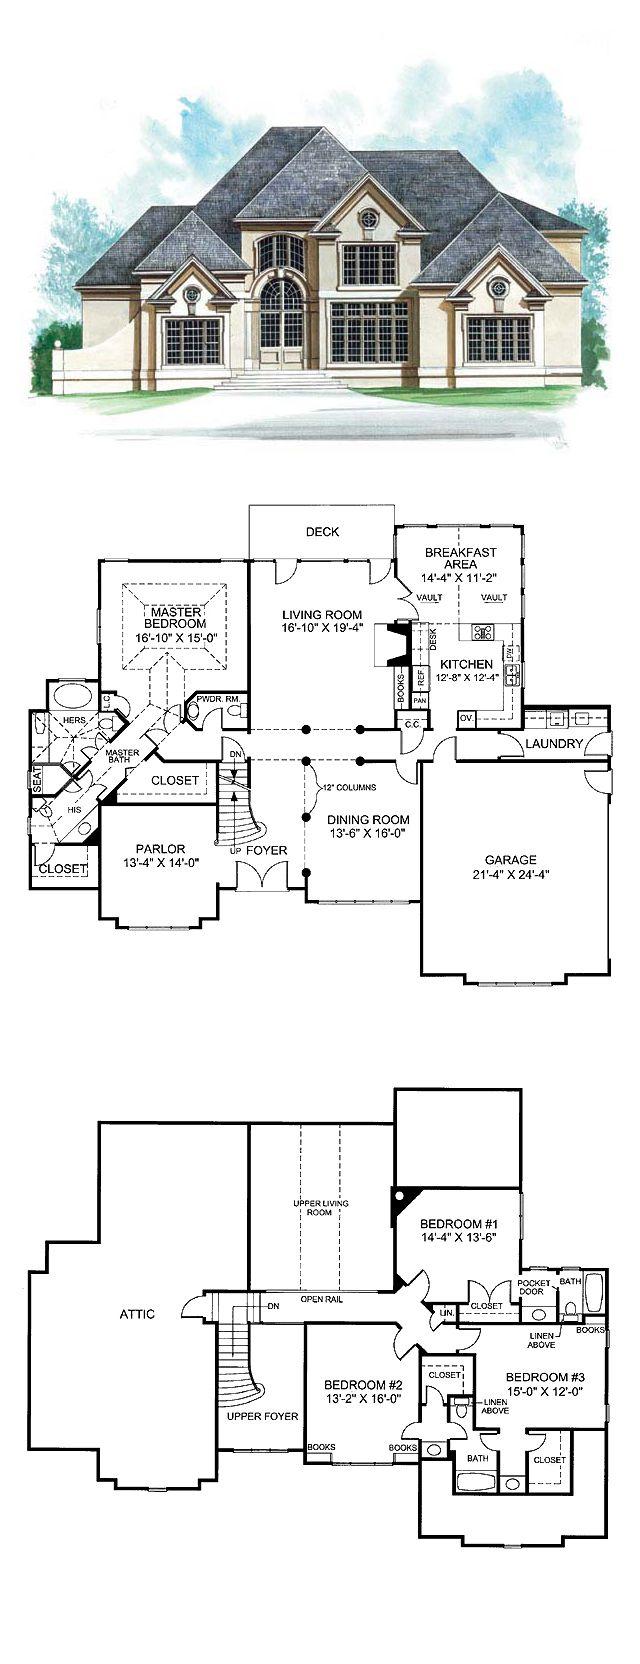 49 best greek revival house plans images on pinterest dream european greek revival house plan 72150